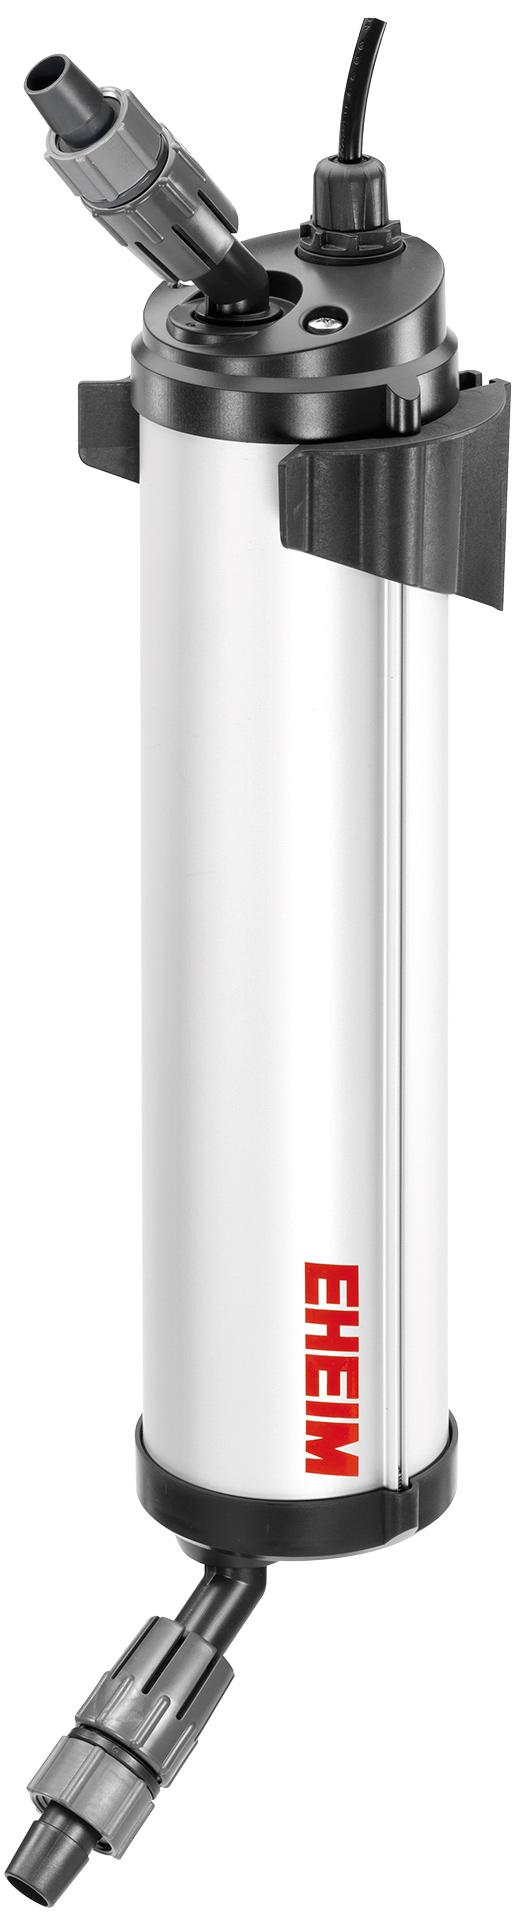 Sterilizátor EHEIM Reeflex UV 800,11W, 400-800l